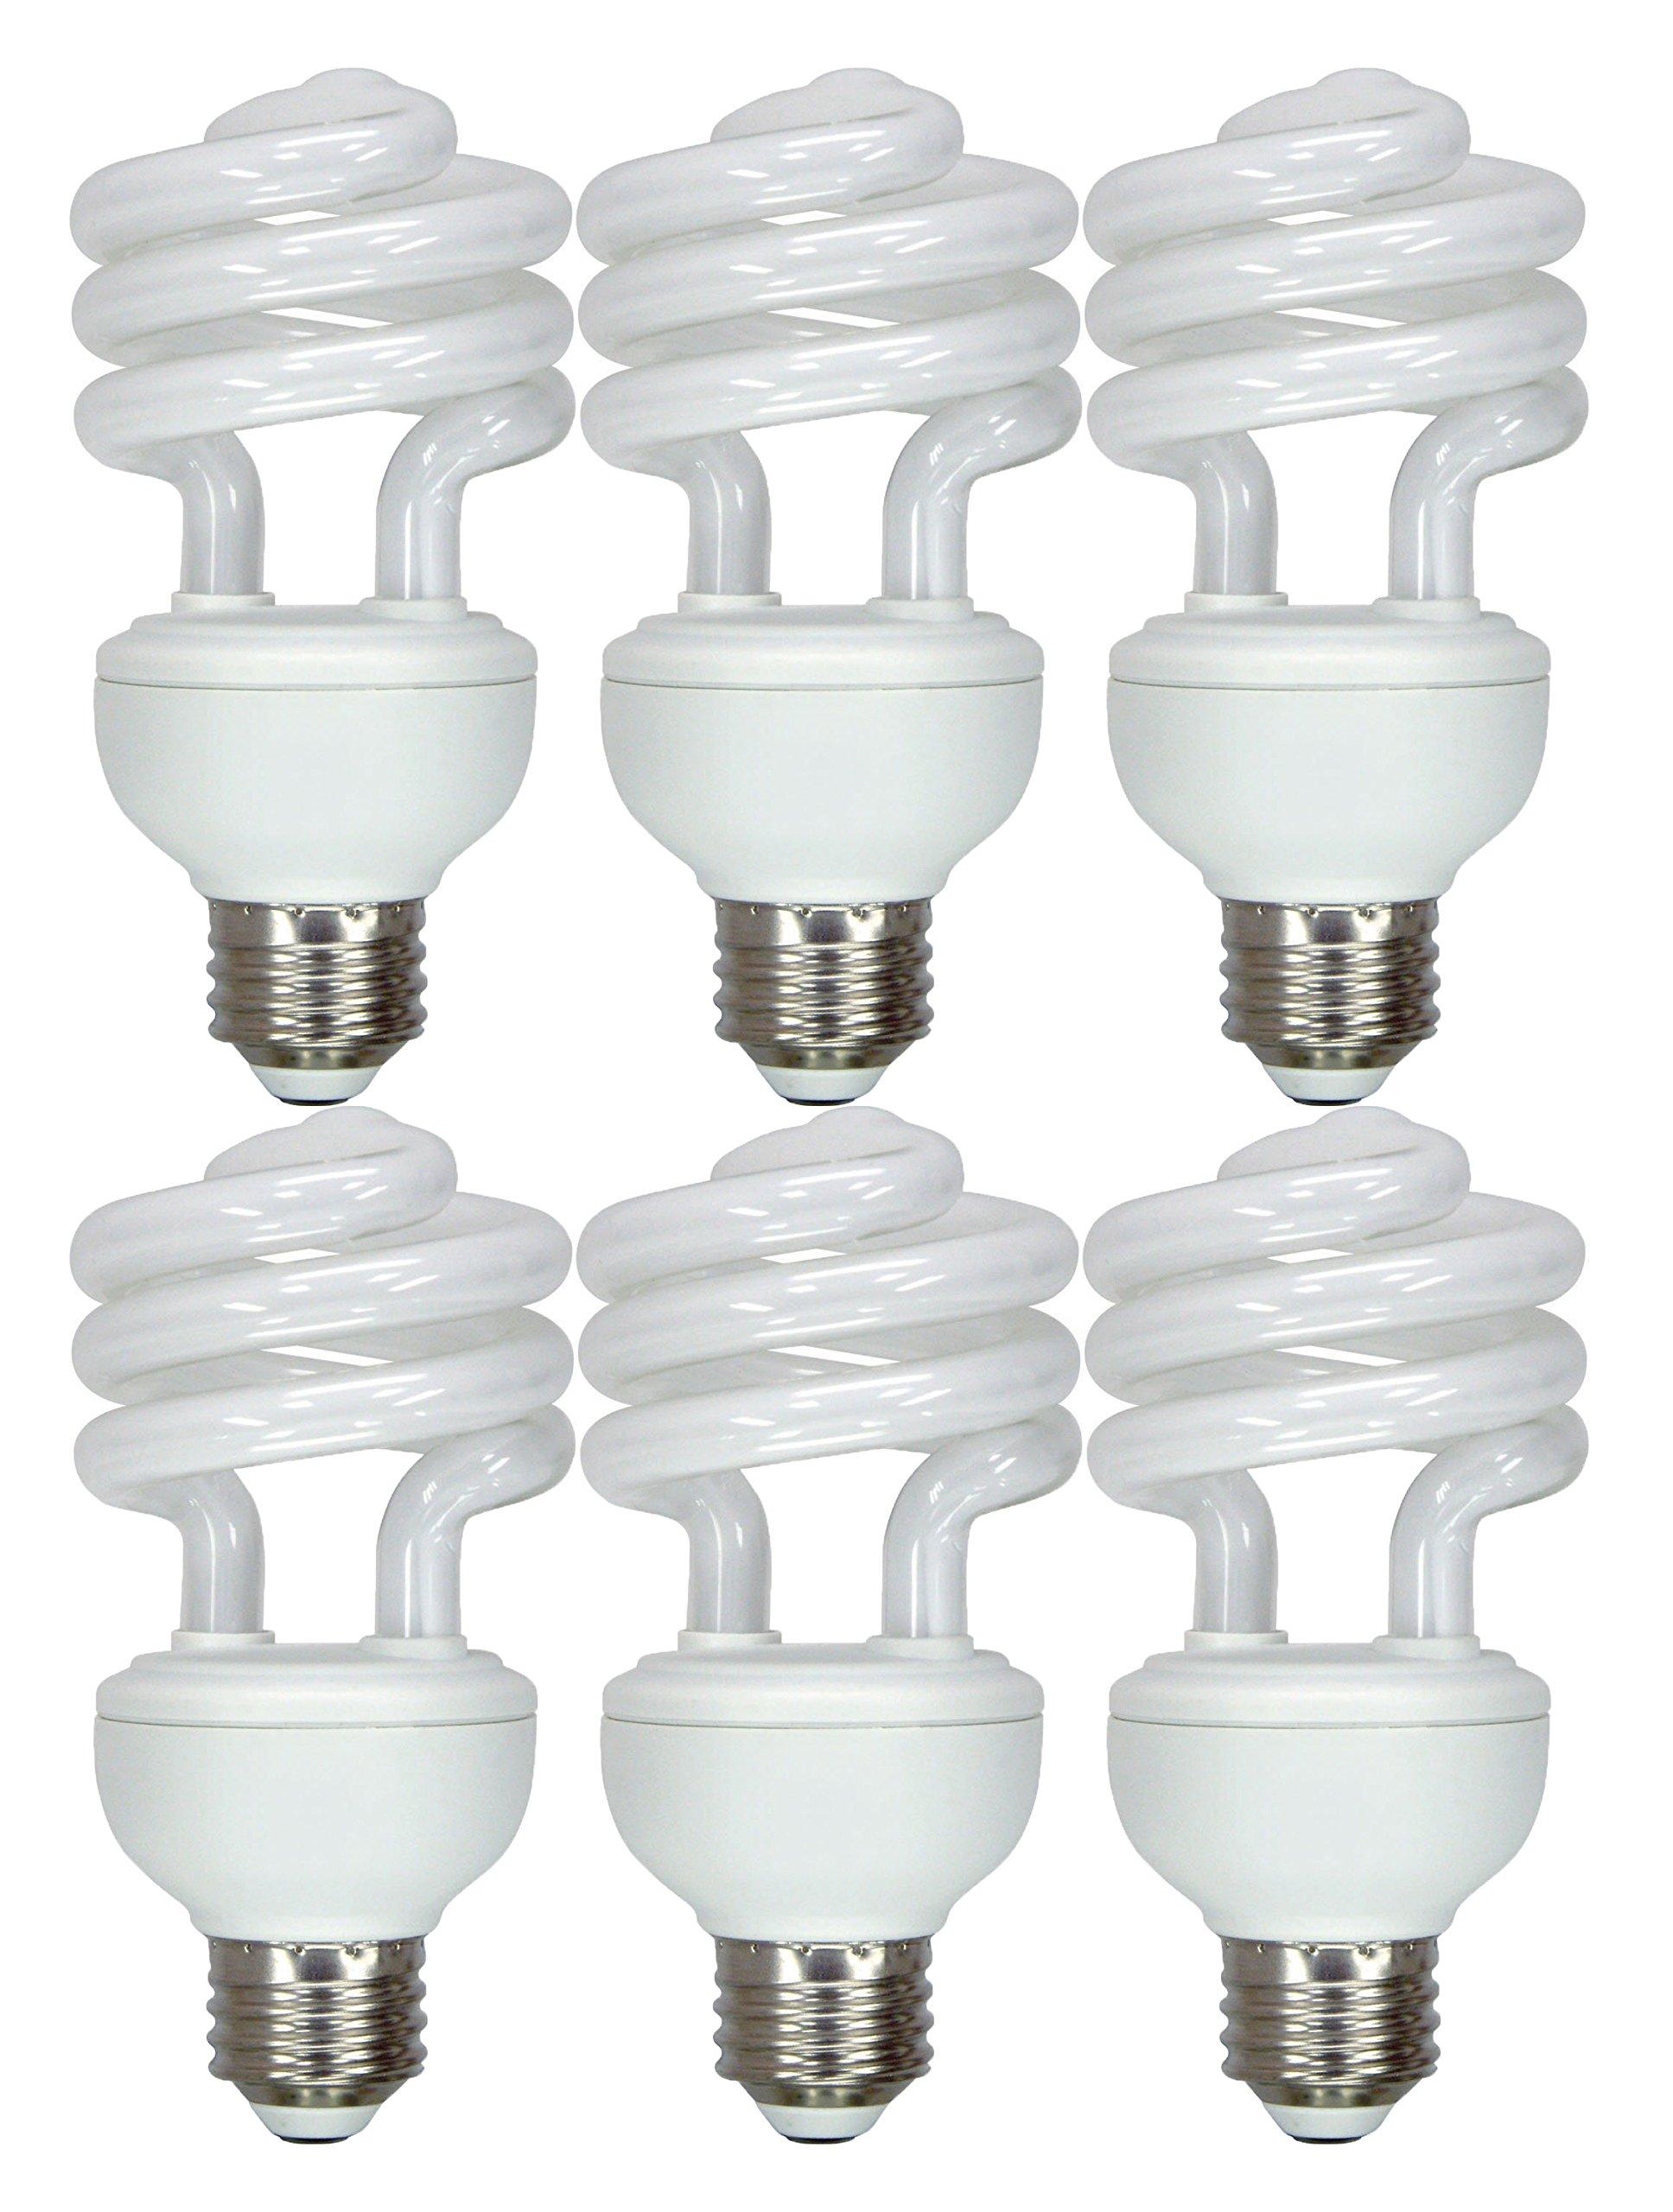 GE Energy Smart CFL Daylight 20-Watt (75-Watt Equivalent) 1300-Lumen T3 Medium Base Spiral Light Bulb - 6 Bulbs